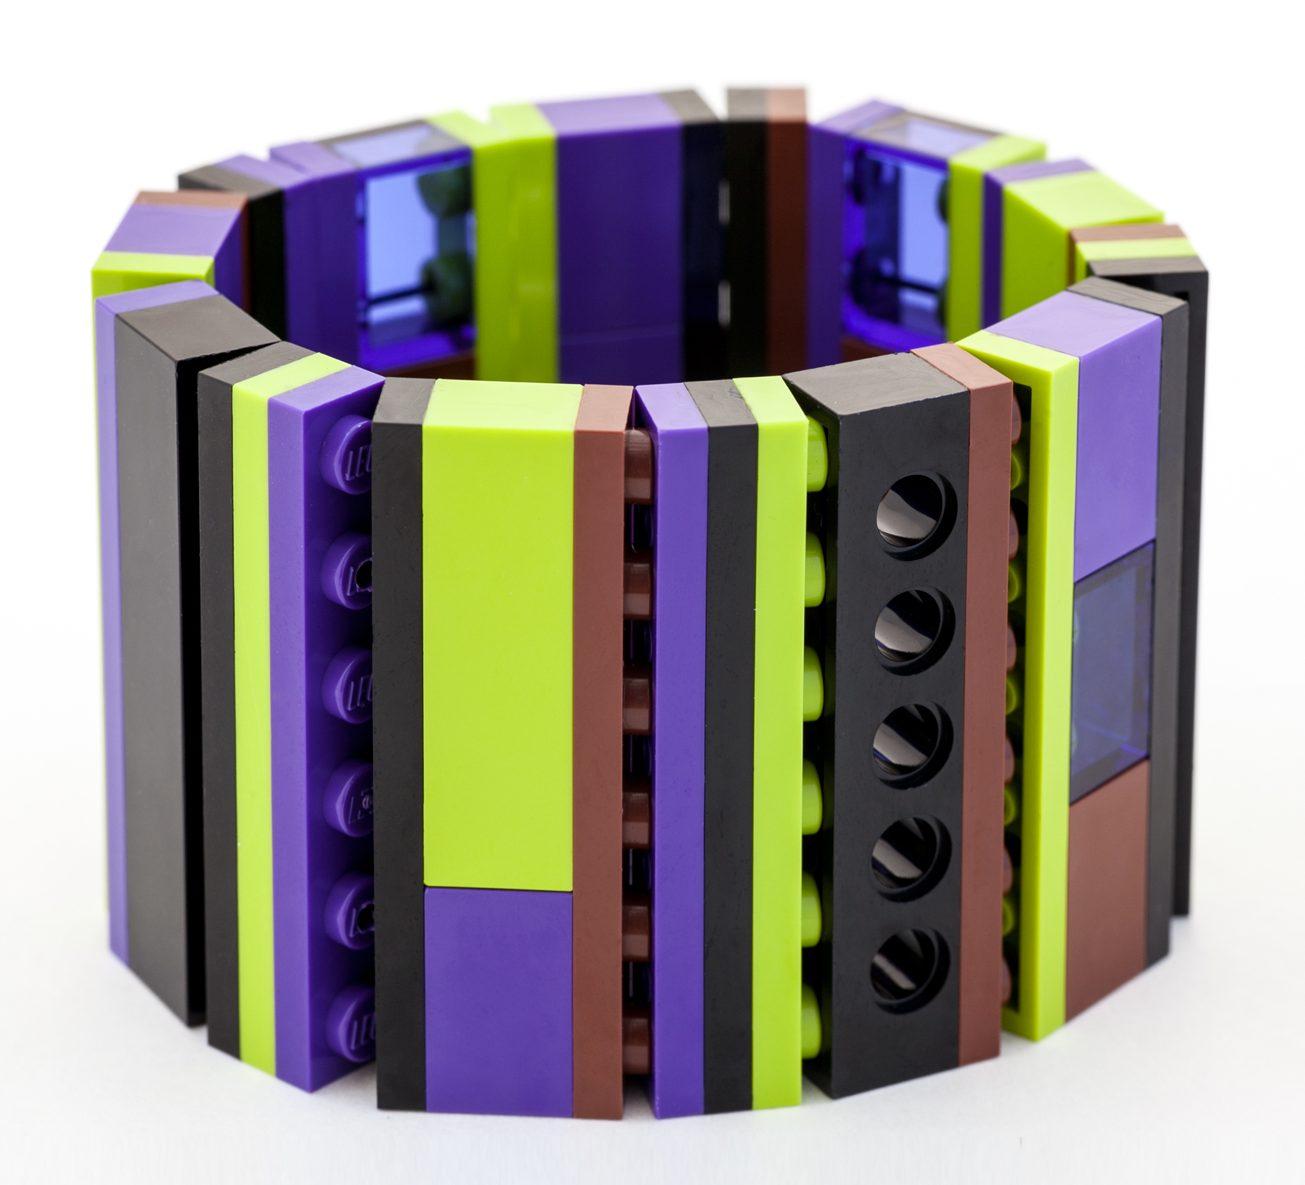 Emiko Oye, Basic 1x6 Bracelet, armband. Foto met dank aan Emiko Oye, LEGOstenen, koord van rubber